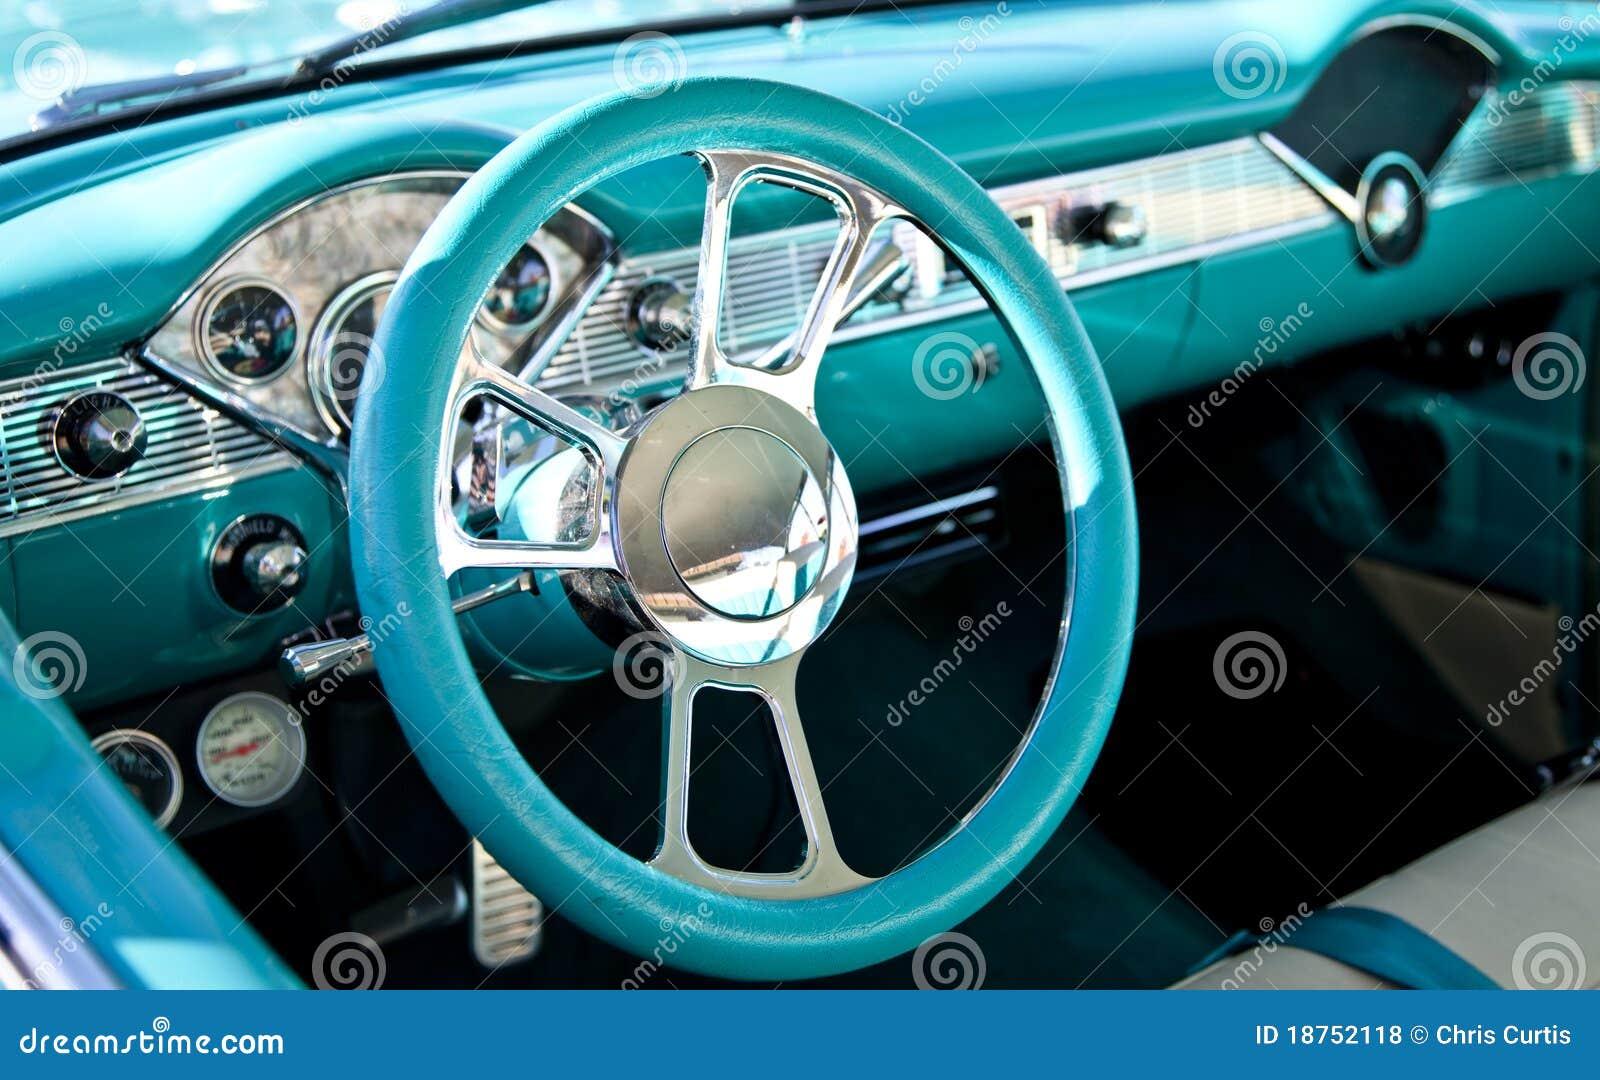 sports car interior in swede leather stock image 26033413. Black Bedroom Furniture Sets. Home Design Ideas